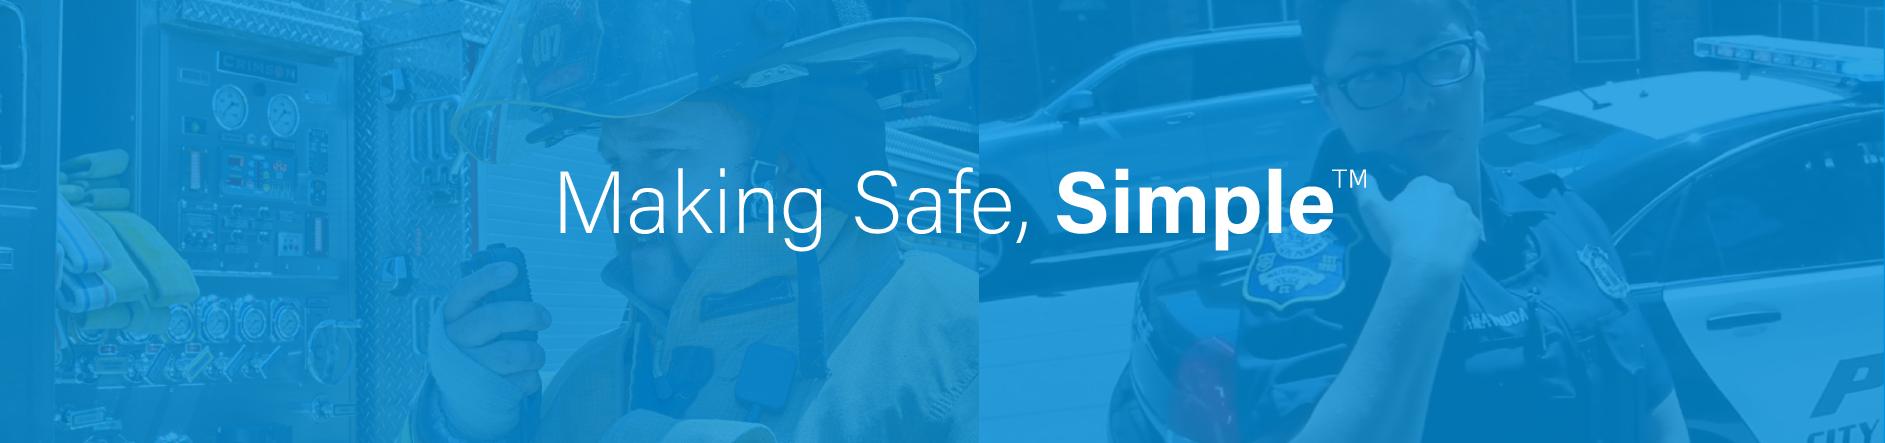 Making Safe Simple